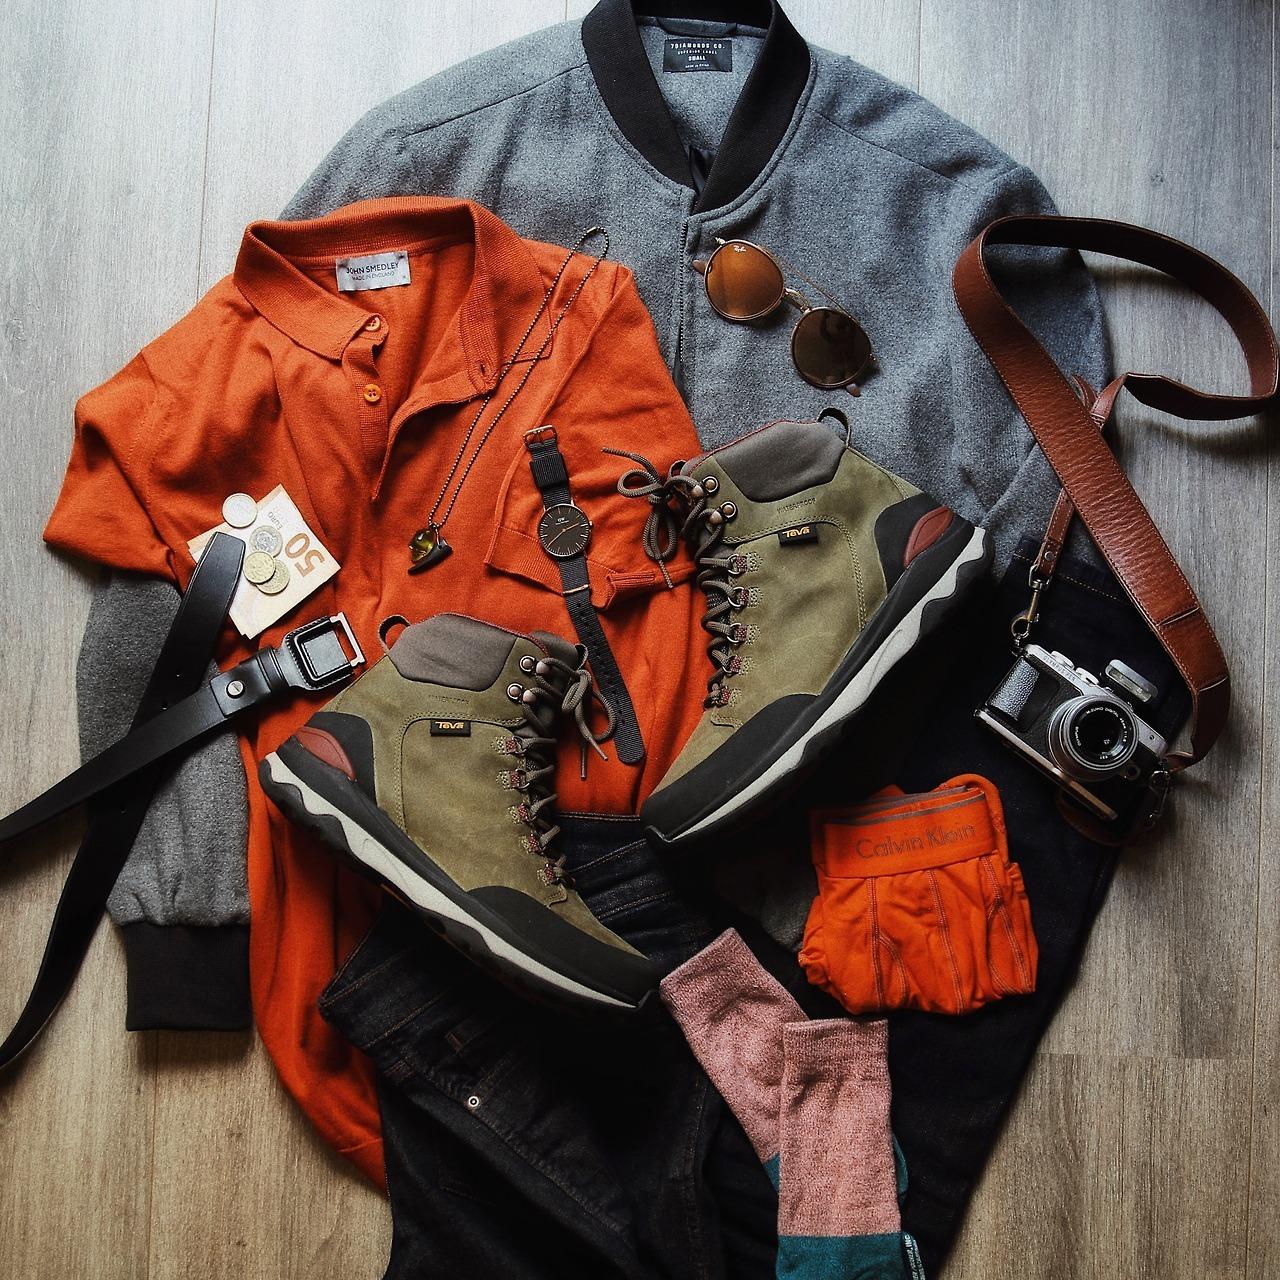 What I'm wearing: John Smedley polo shirt, 7Diamonds bomber jacket, Dr Denim jeans, Teva boots, Salvatore Ferragamo belt, Daniel Wellington watch, Ray-Ban sunglasses